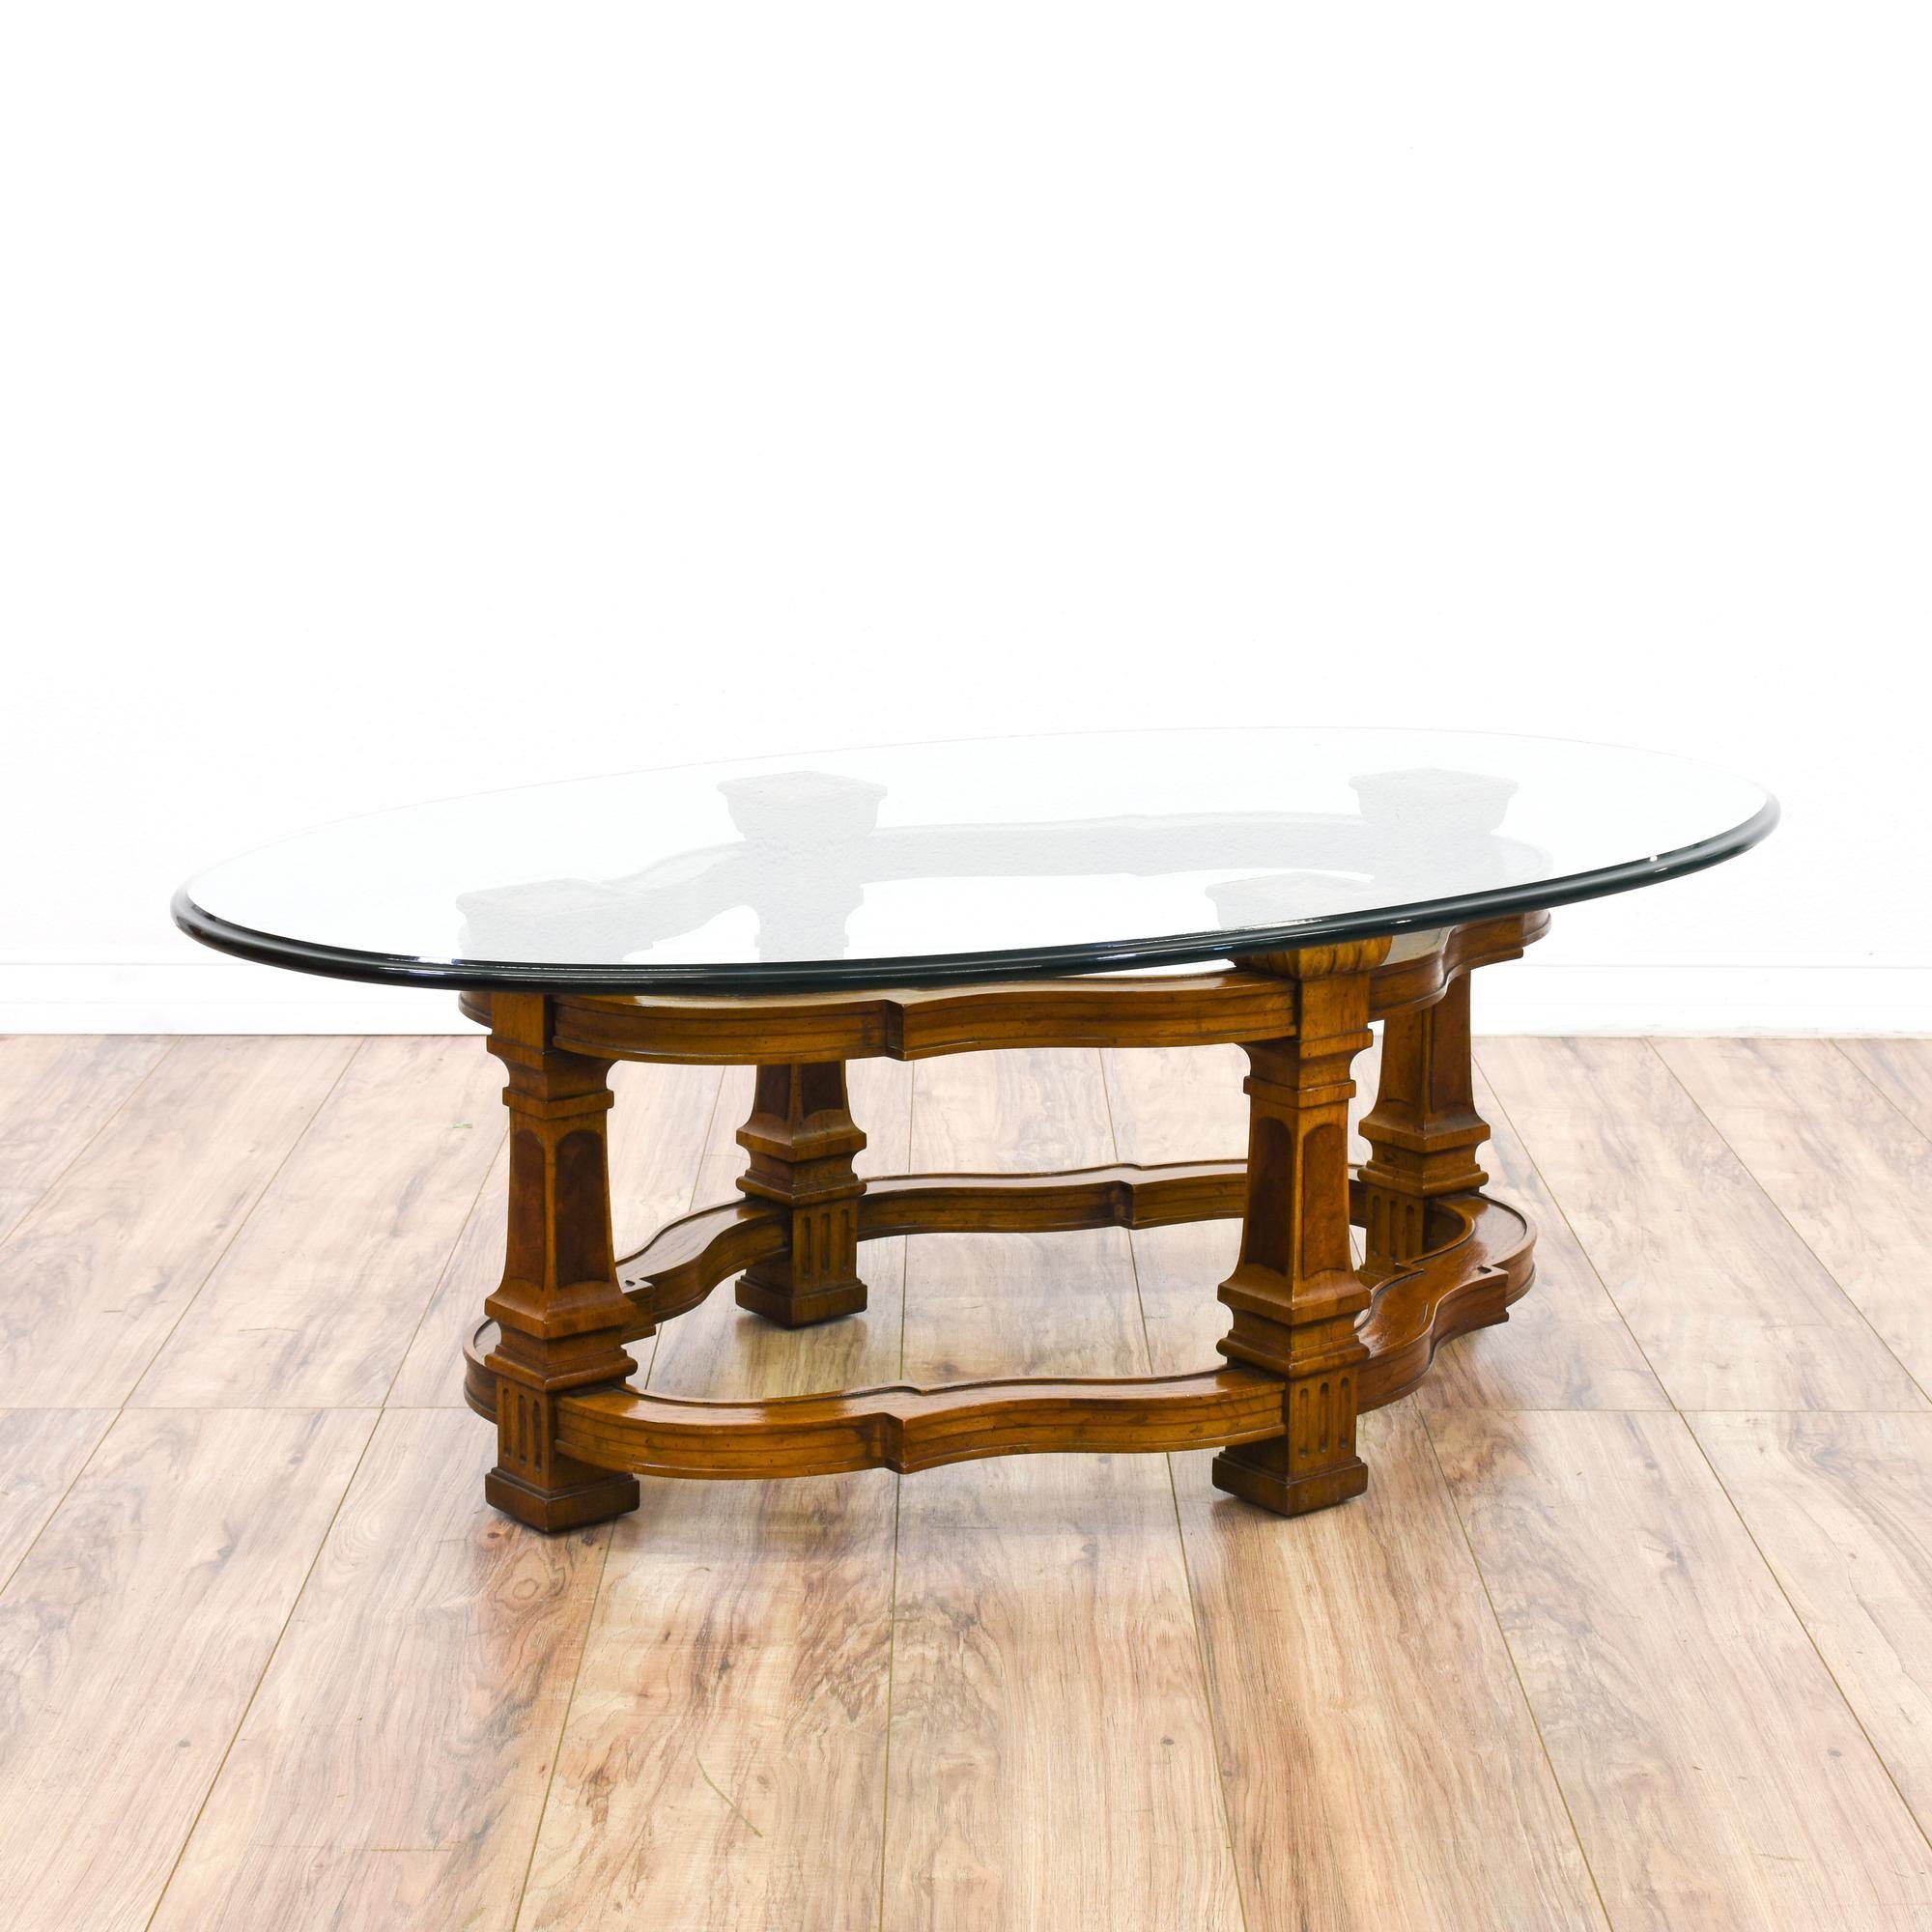 Copeland Walnut Furniture Check Round Glass Top Coffee Table Round Glass Coffee Table Glass Top Coffee Table Glass Coffee Table [ 2160 x 1200 Pixel ]